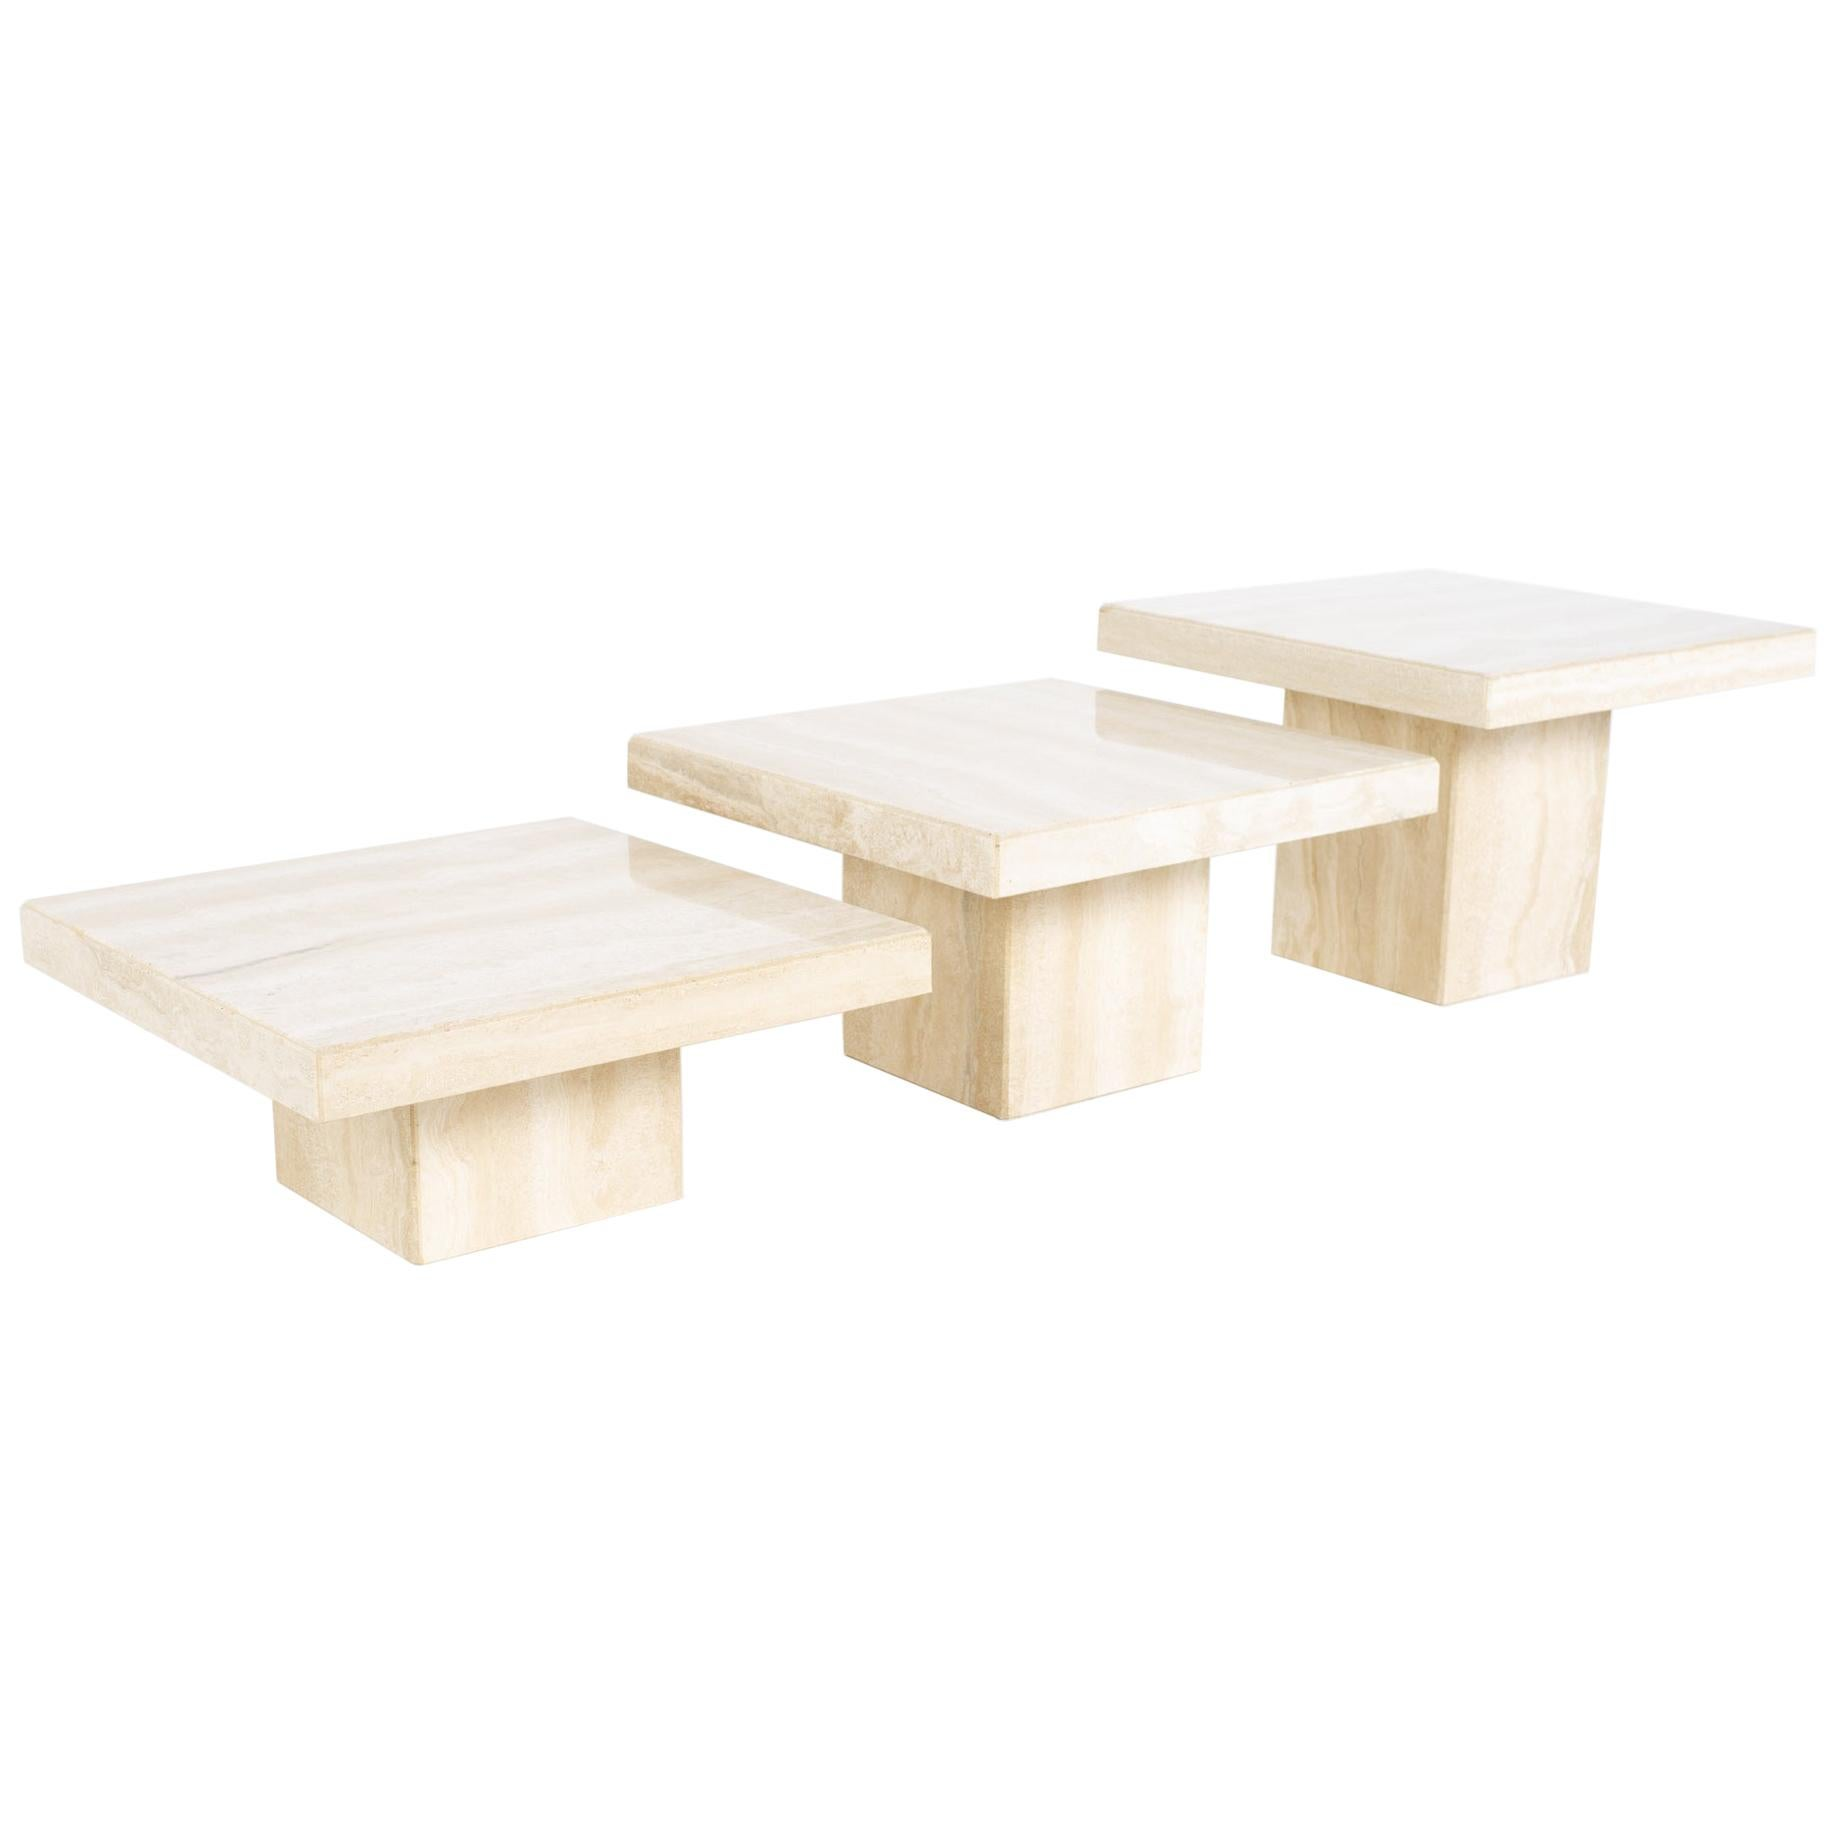 Stone International MCM Italian Travertine Marble Coffee Table Set, 3 Piece